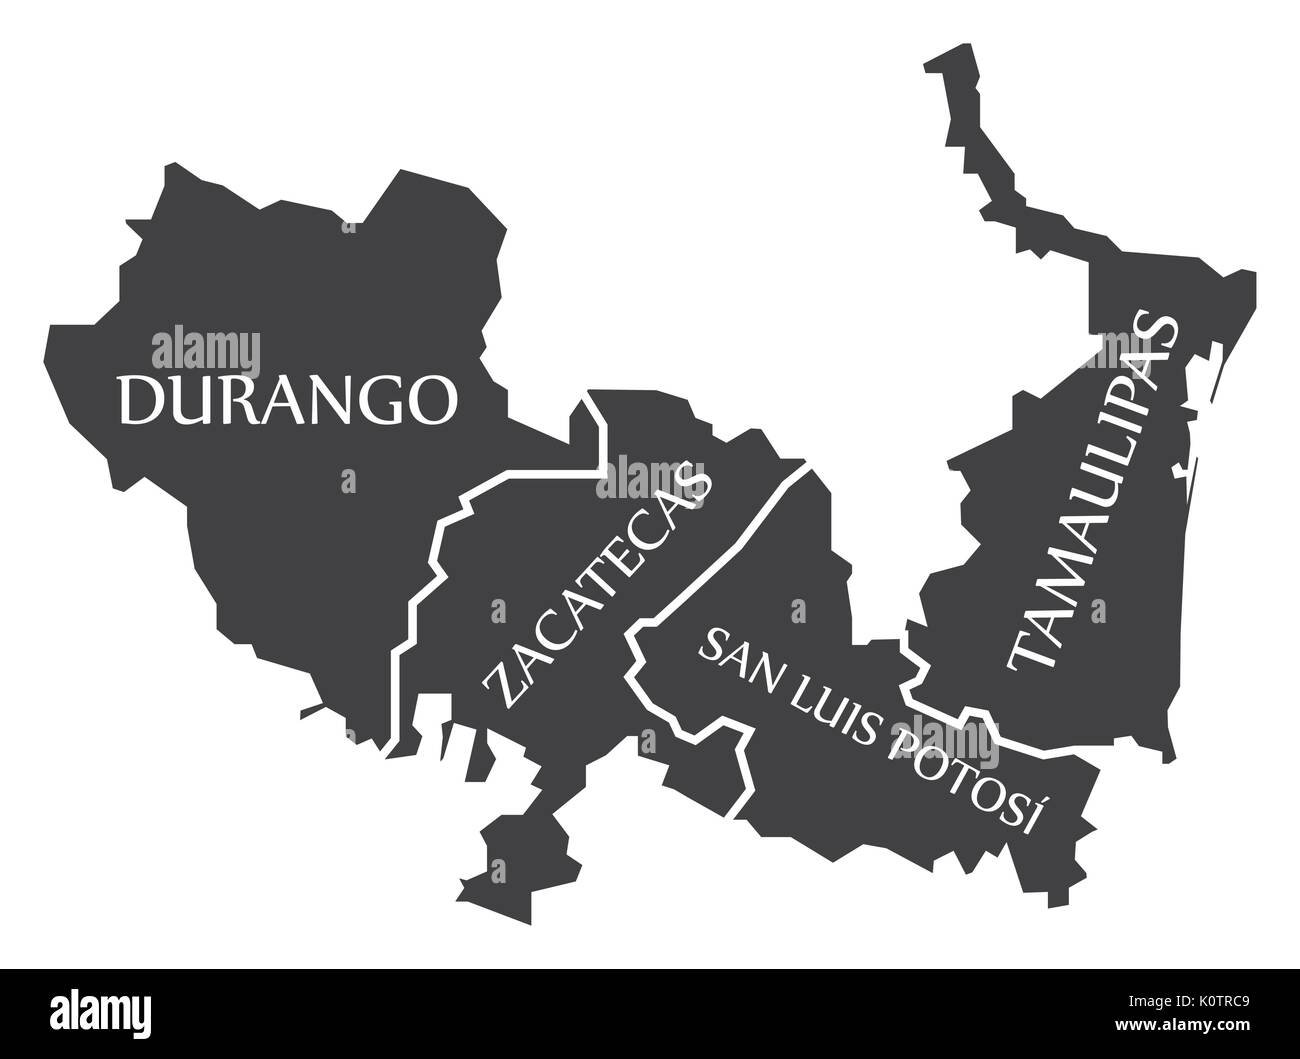 Durango - Zacatecas - San Luis Potosi - Tamaulipas Map Mexico illustration - Stock Image